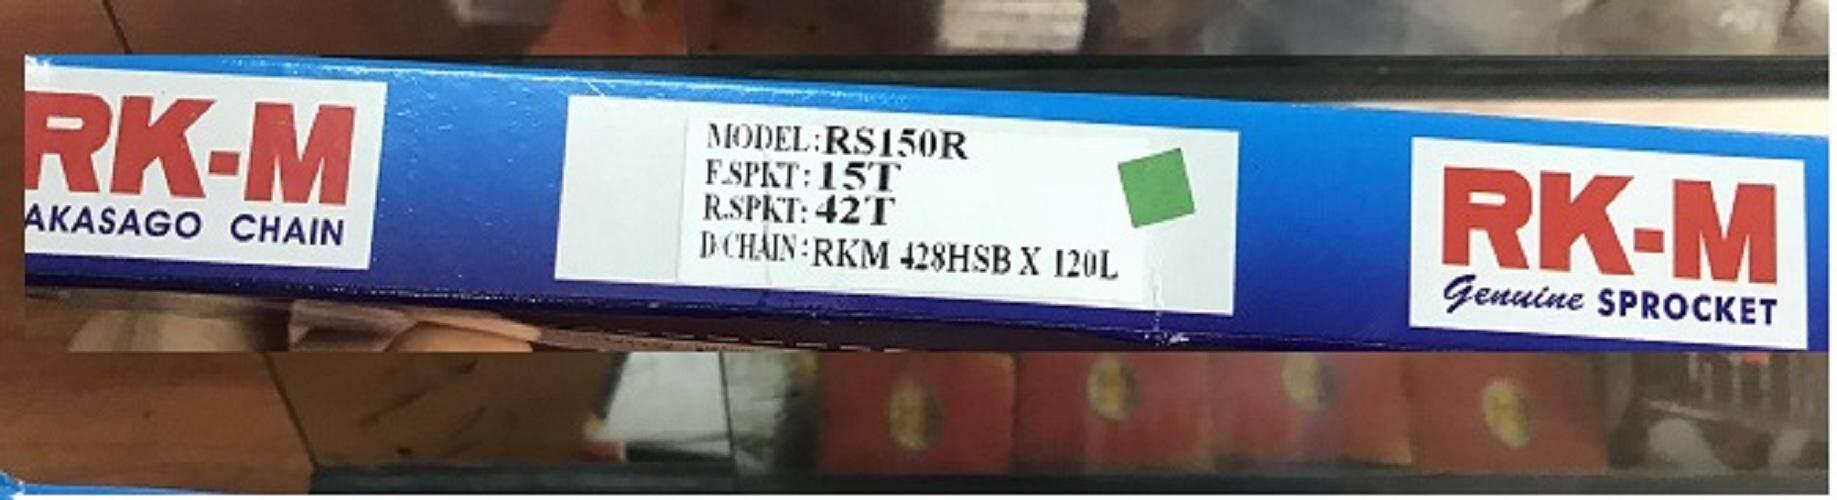 SPROCKET FRONT LC135 428HT X 14T RKM